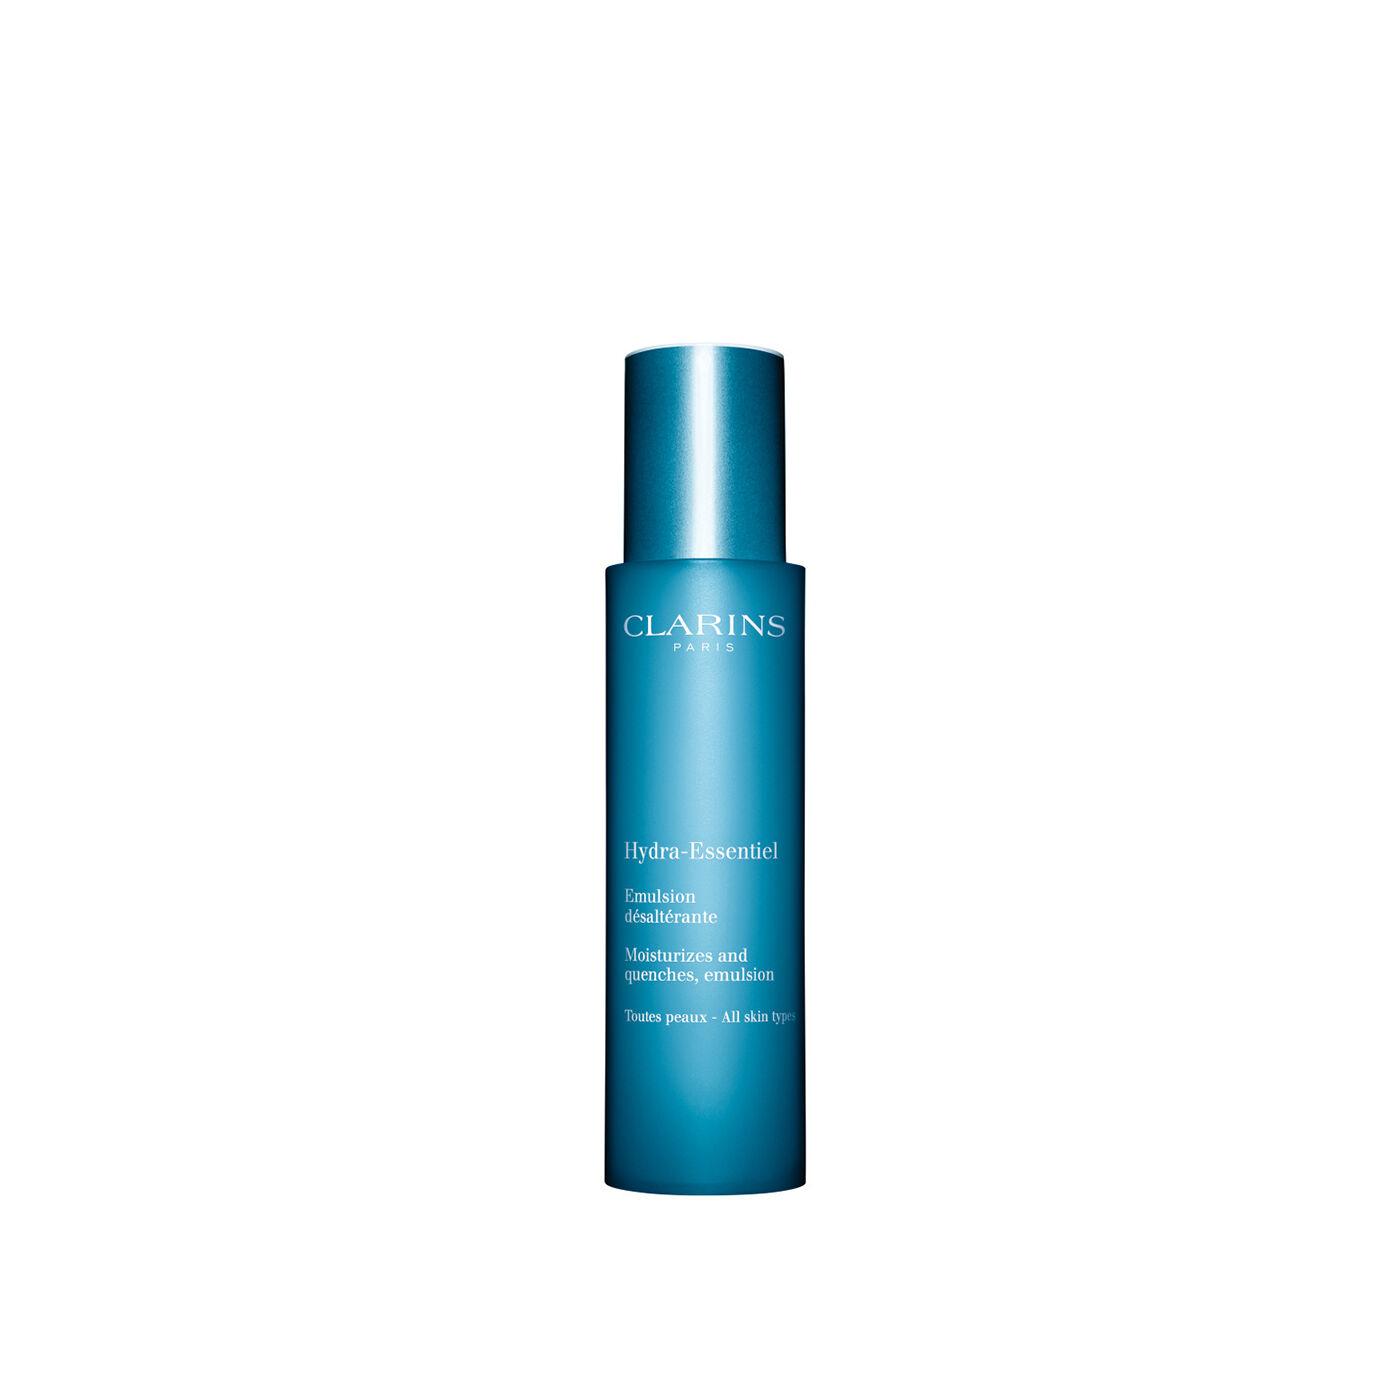 Hydra Essentiel Emulsion (All Skin Types)